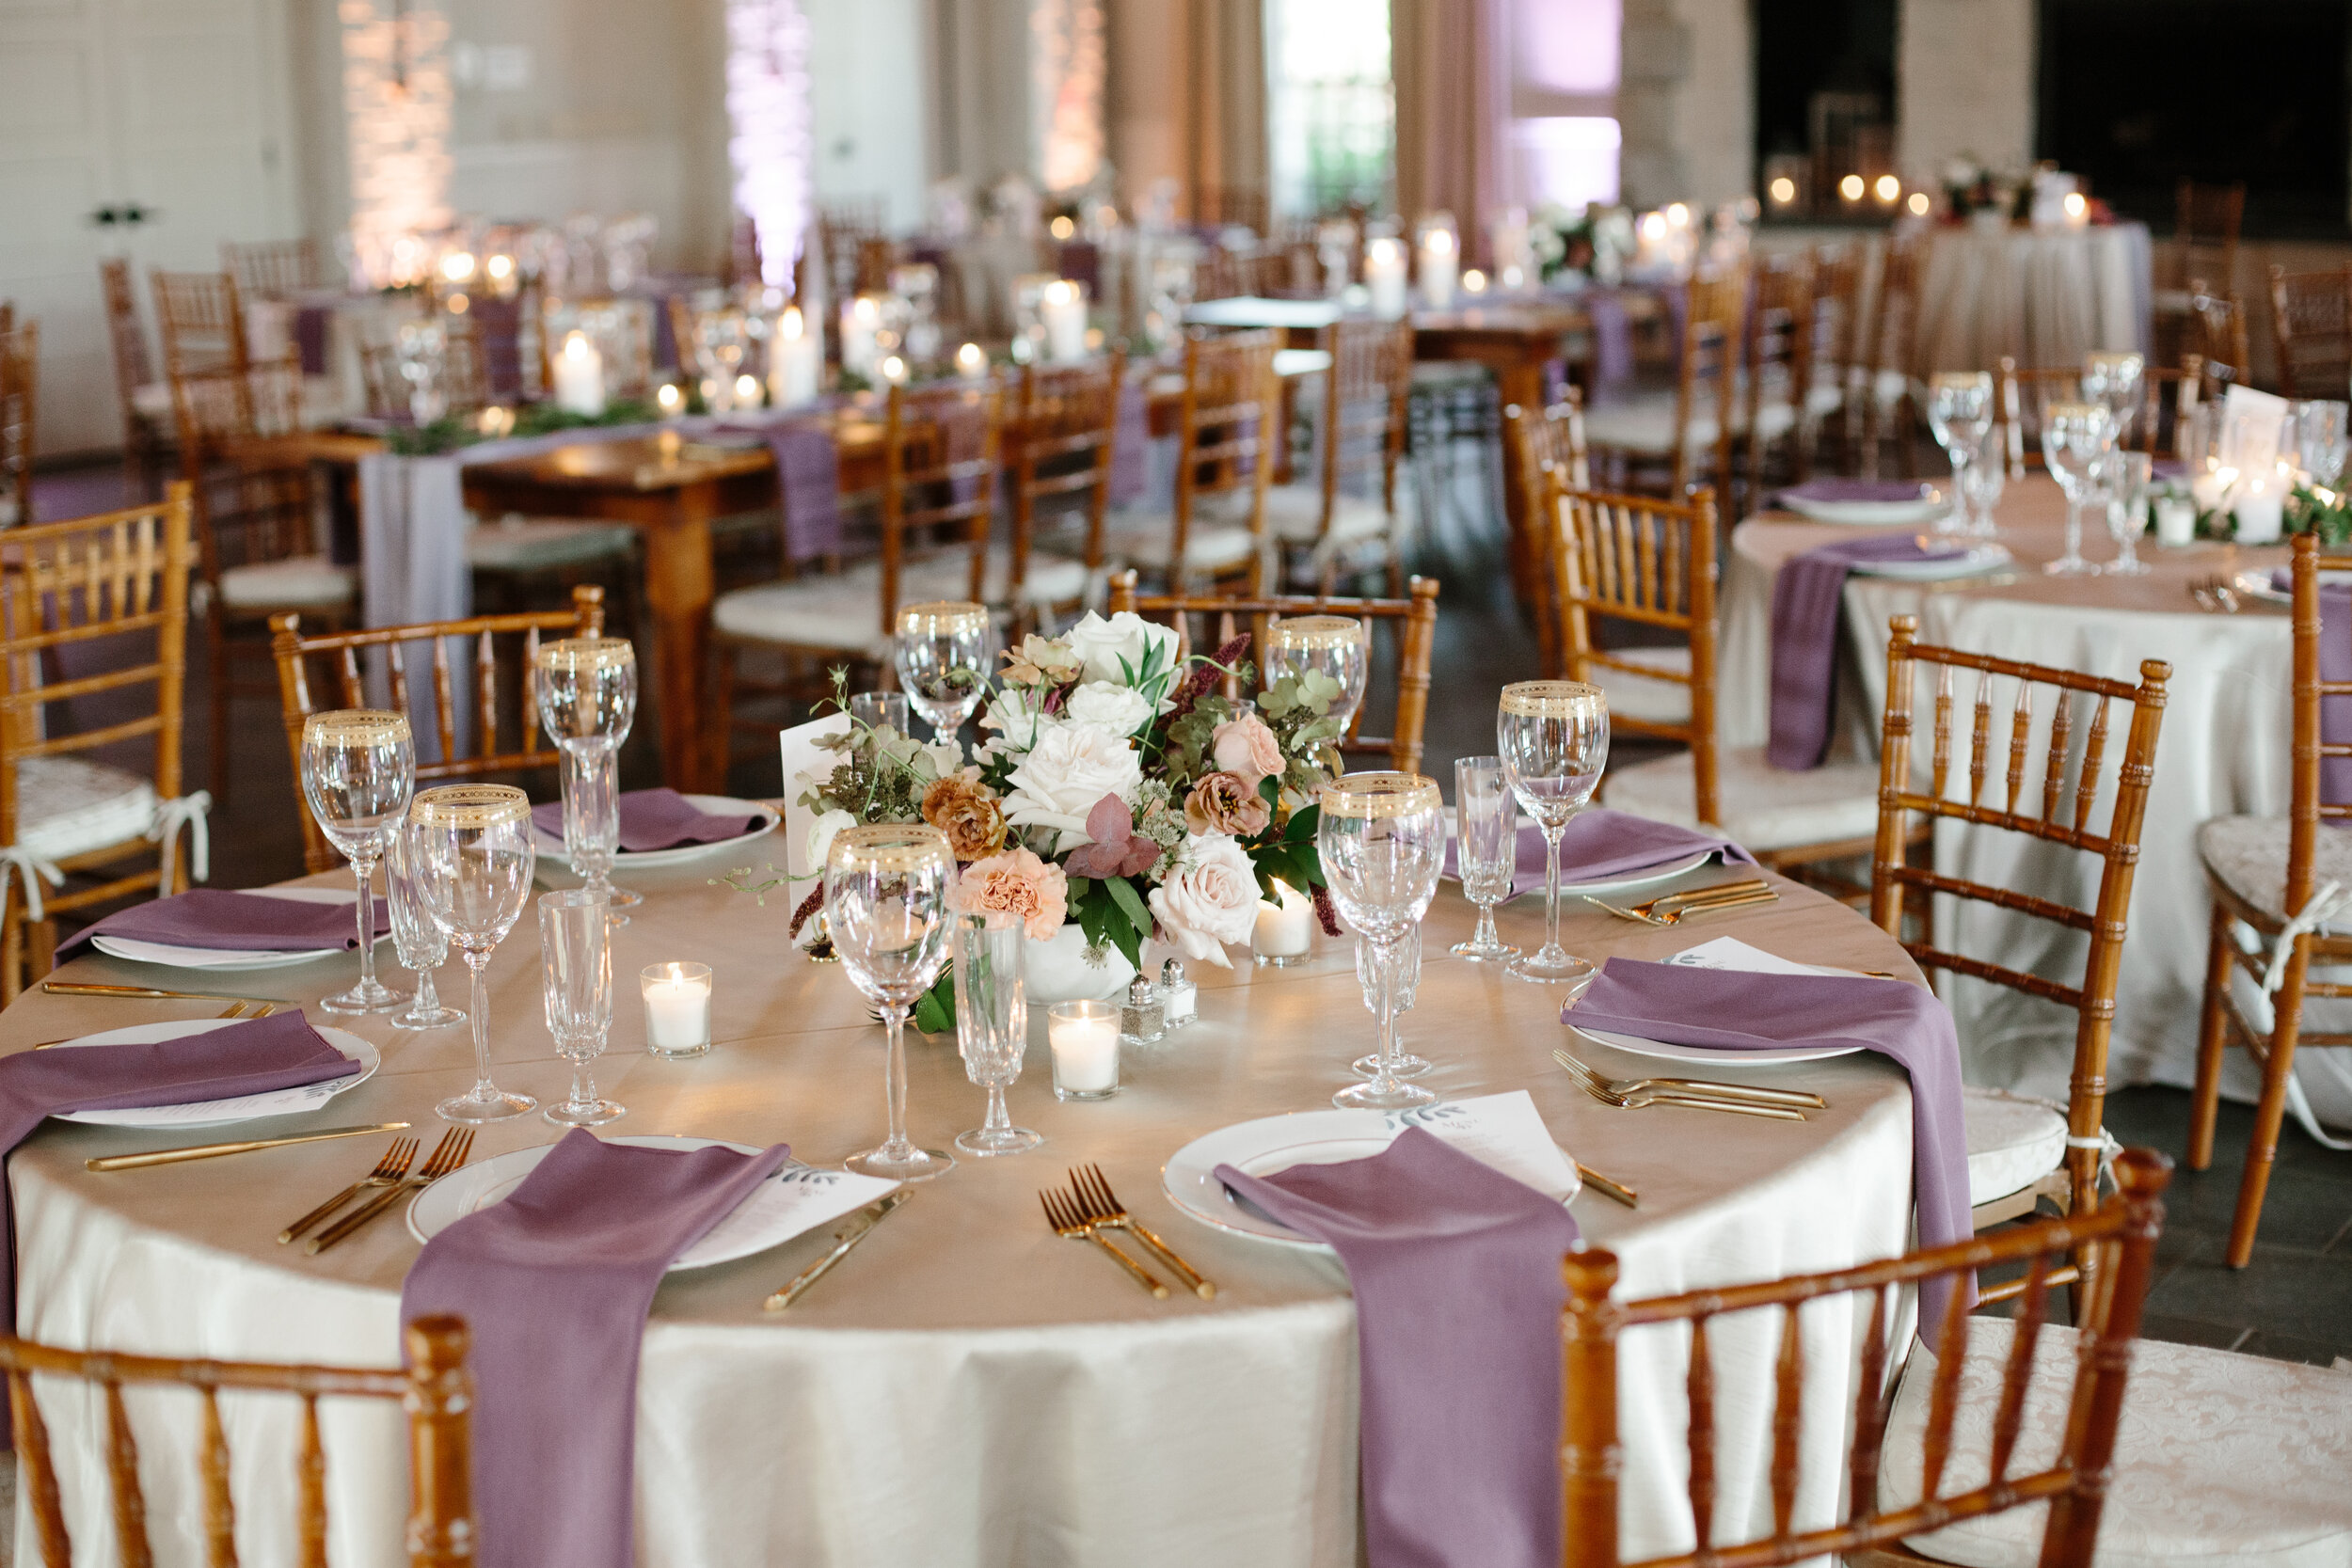 Shante-Asteway-Wedding-Andrew-Roby-Events-8.jpg